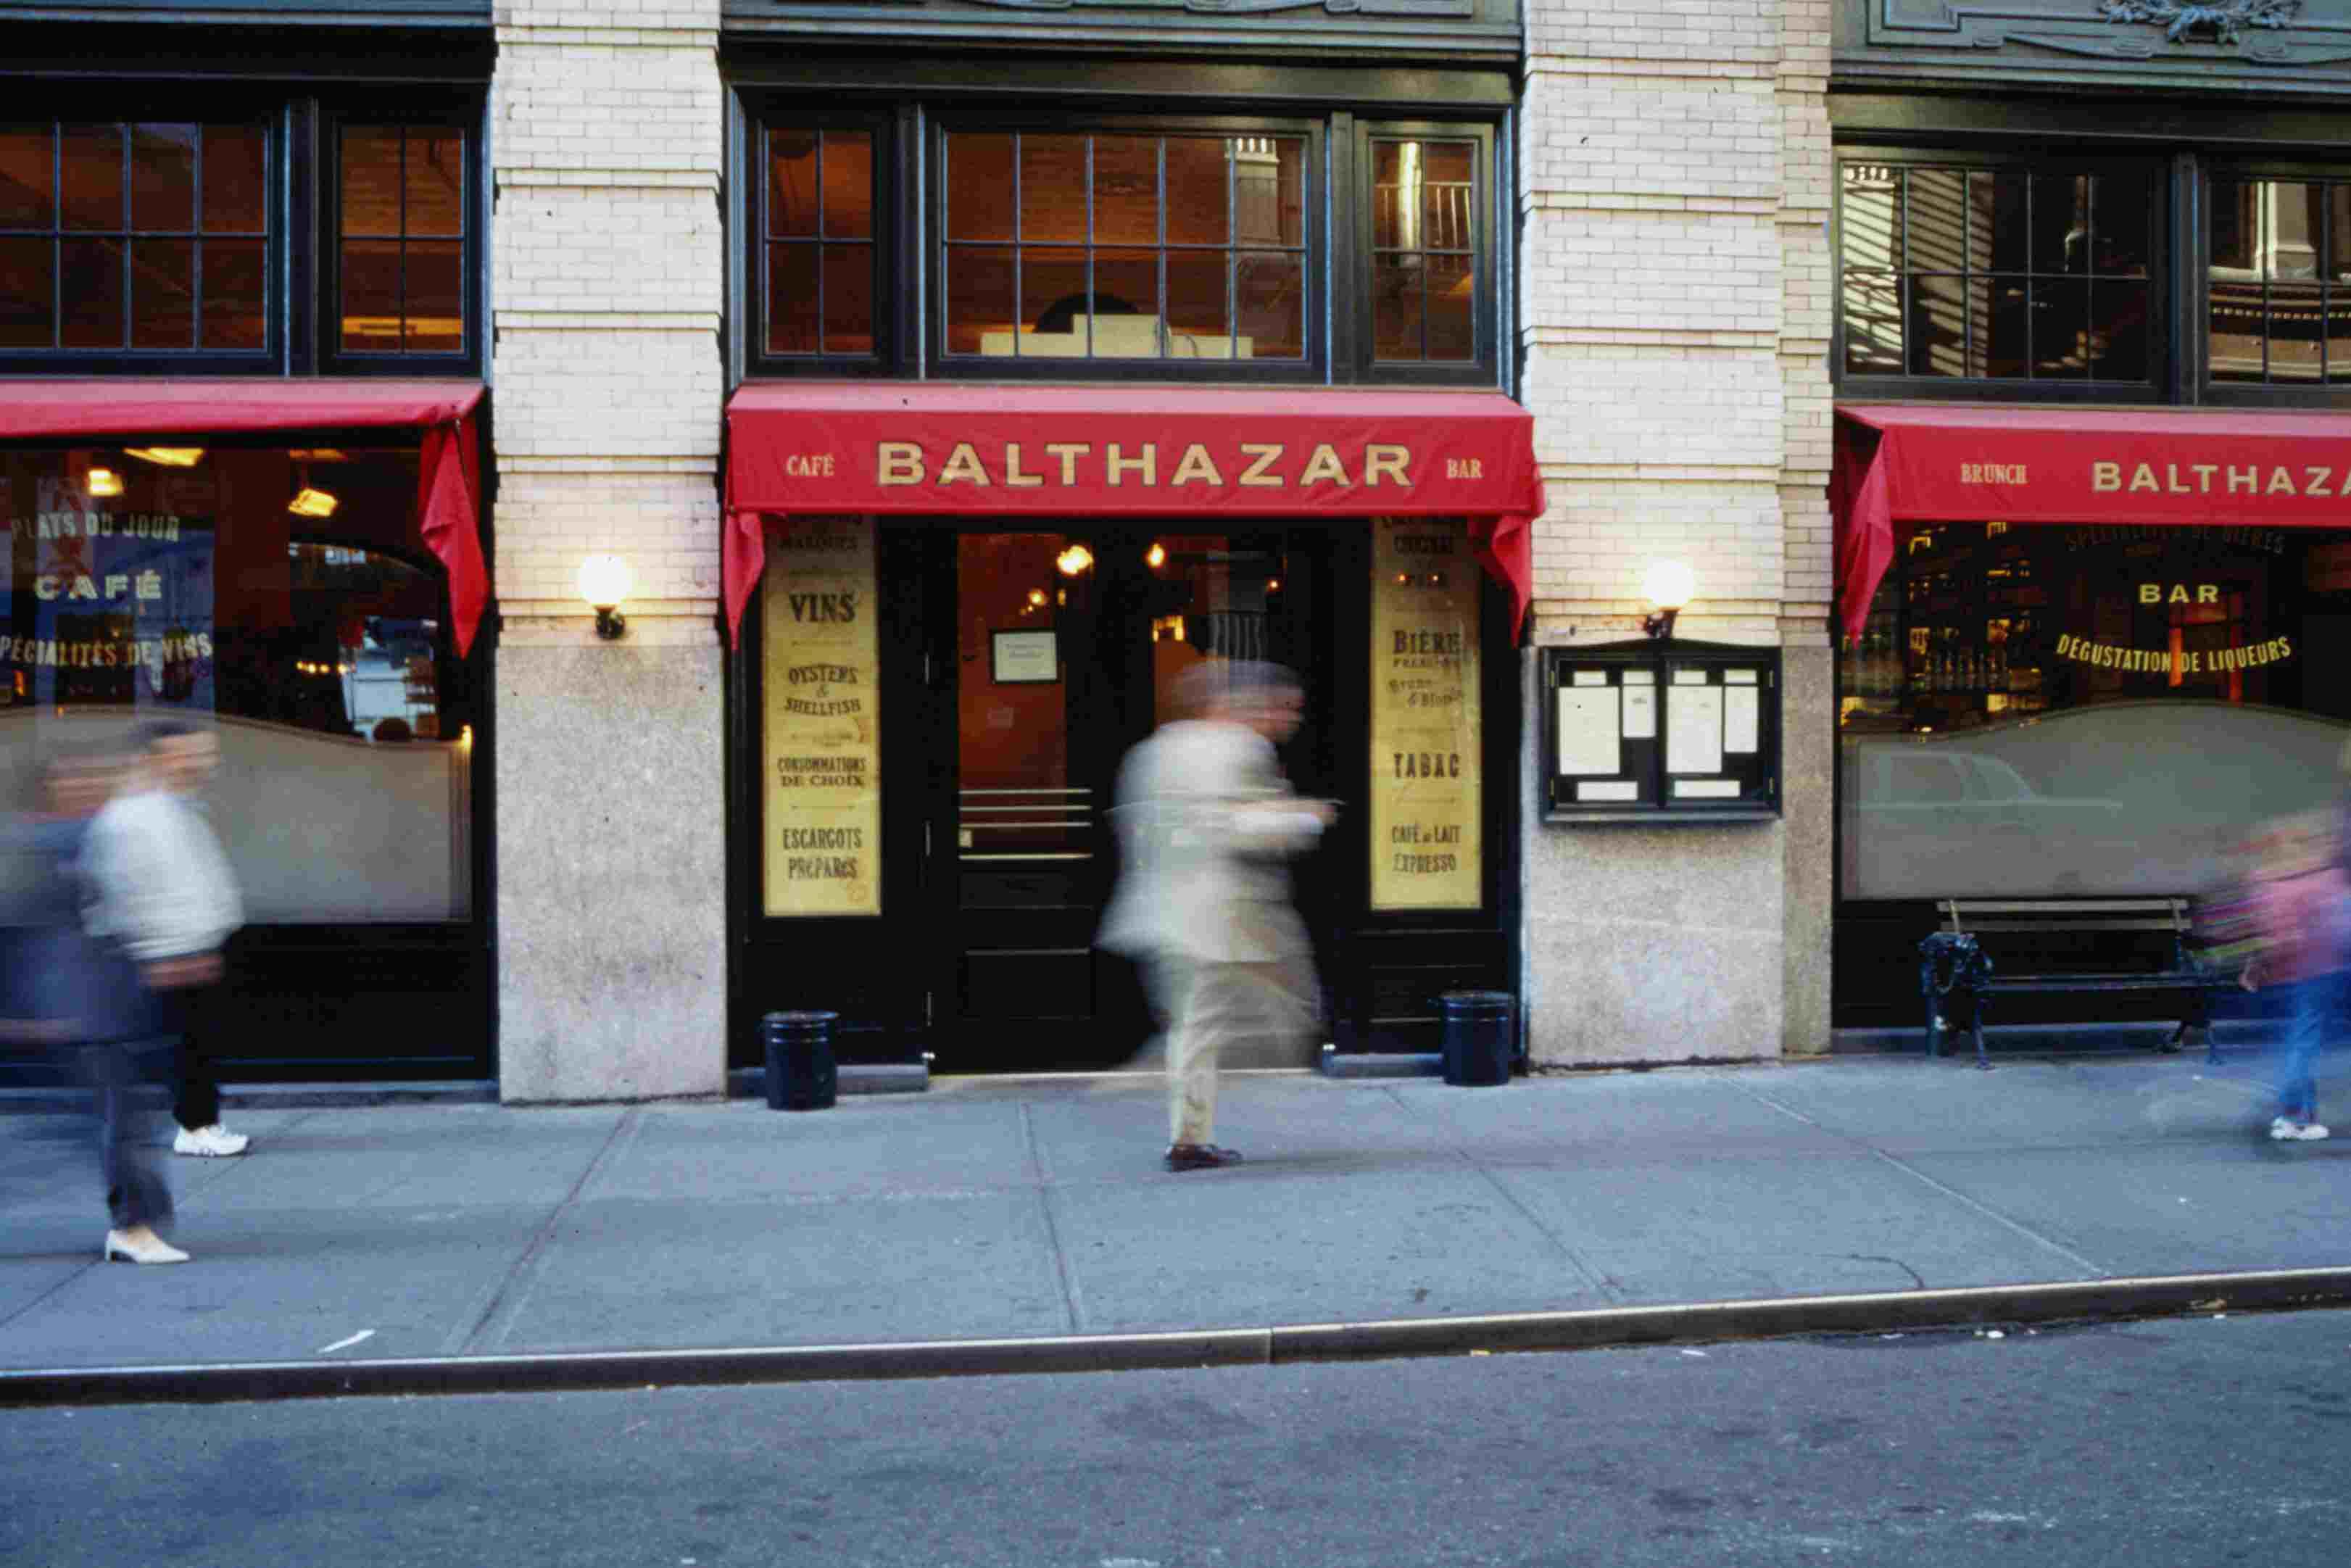 Balthazar Restaurant in Little Italy - New York City, New York